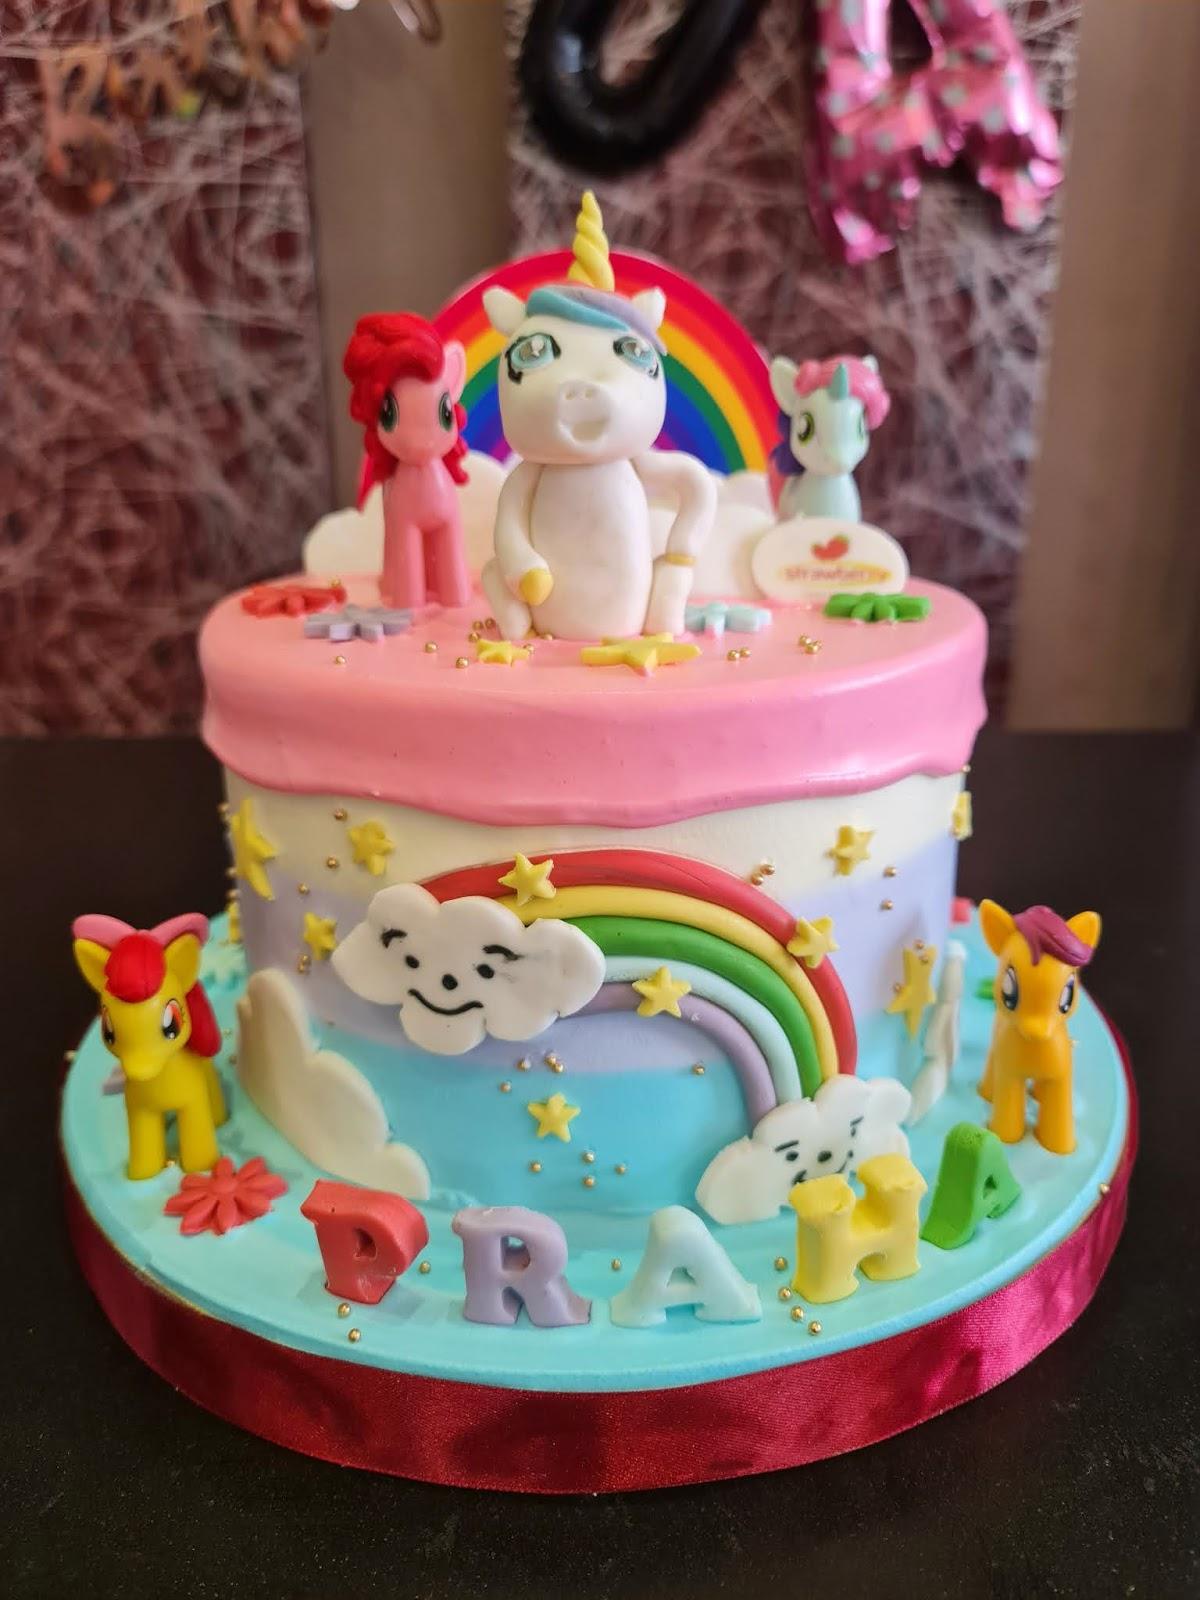 Kue Tart Cirebon, Birthday Cake Cirebon, Custom Cake Cirebon, Kue Ulang Tahun Cirebon, Bakery Cirebon, Toko Kue Cirebon